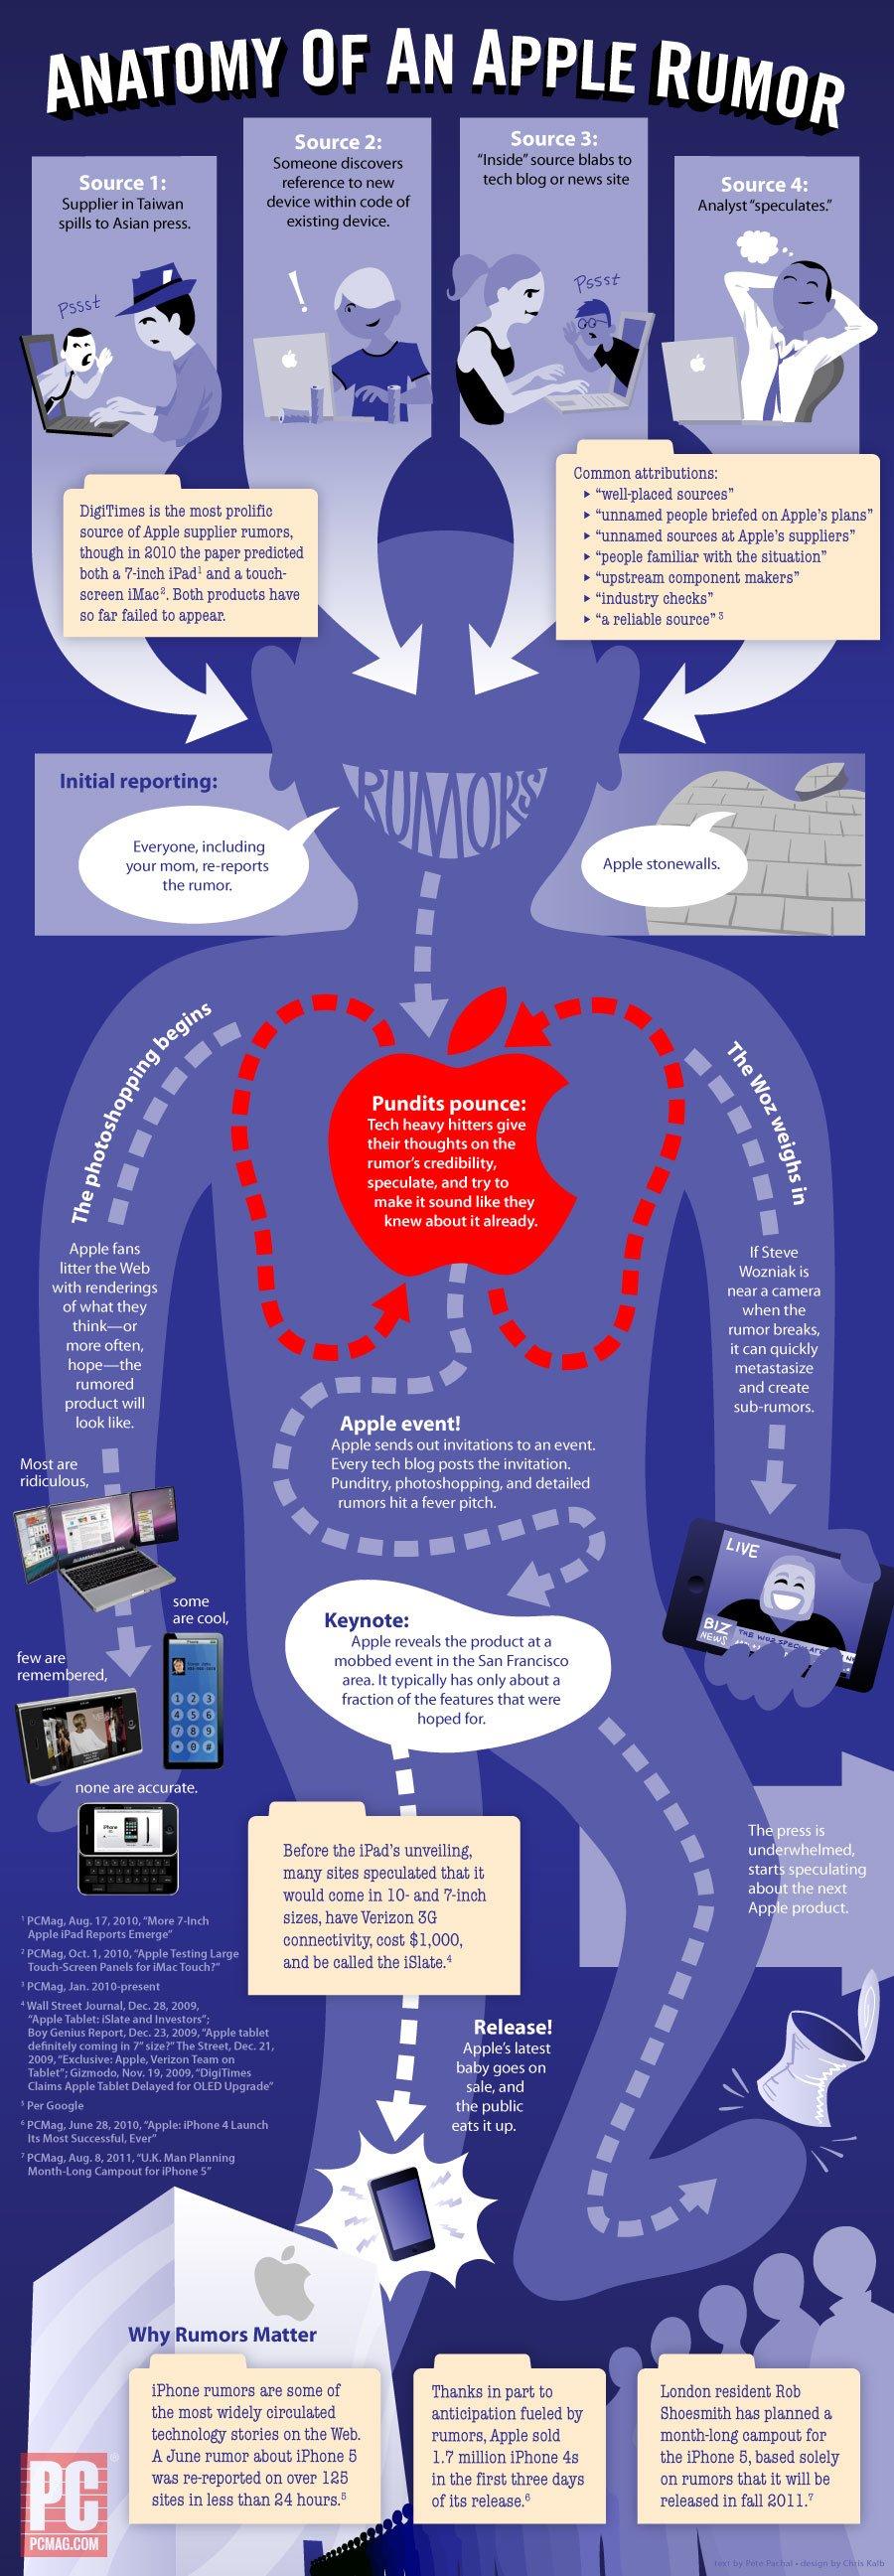 Anatomy of Apple Rumors